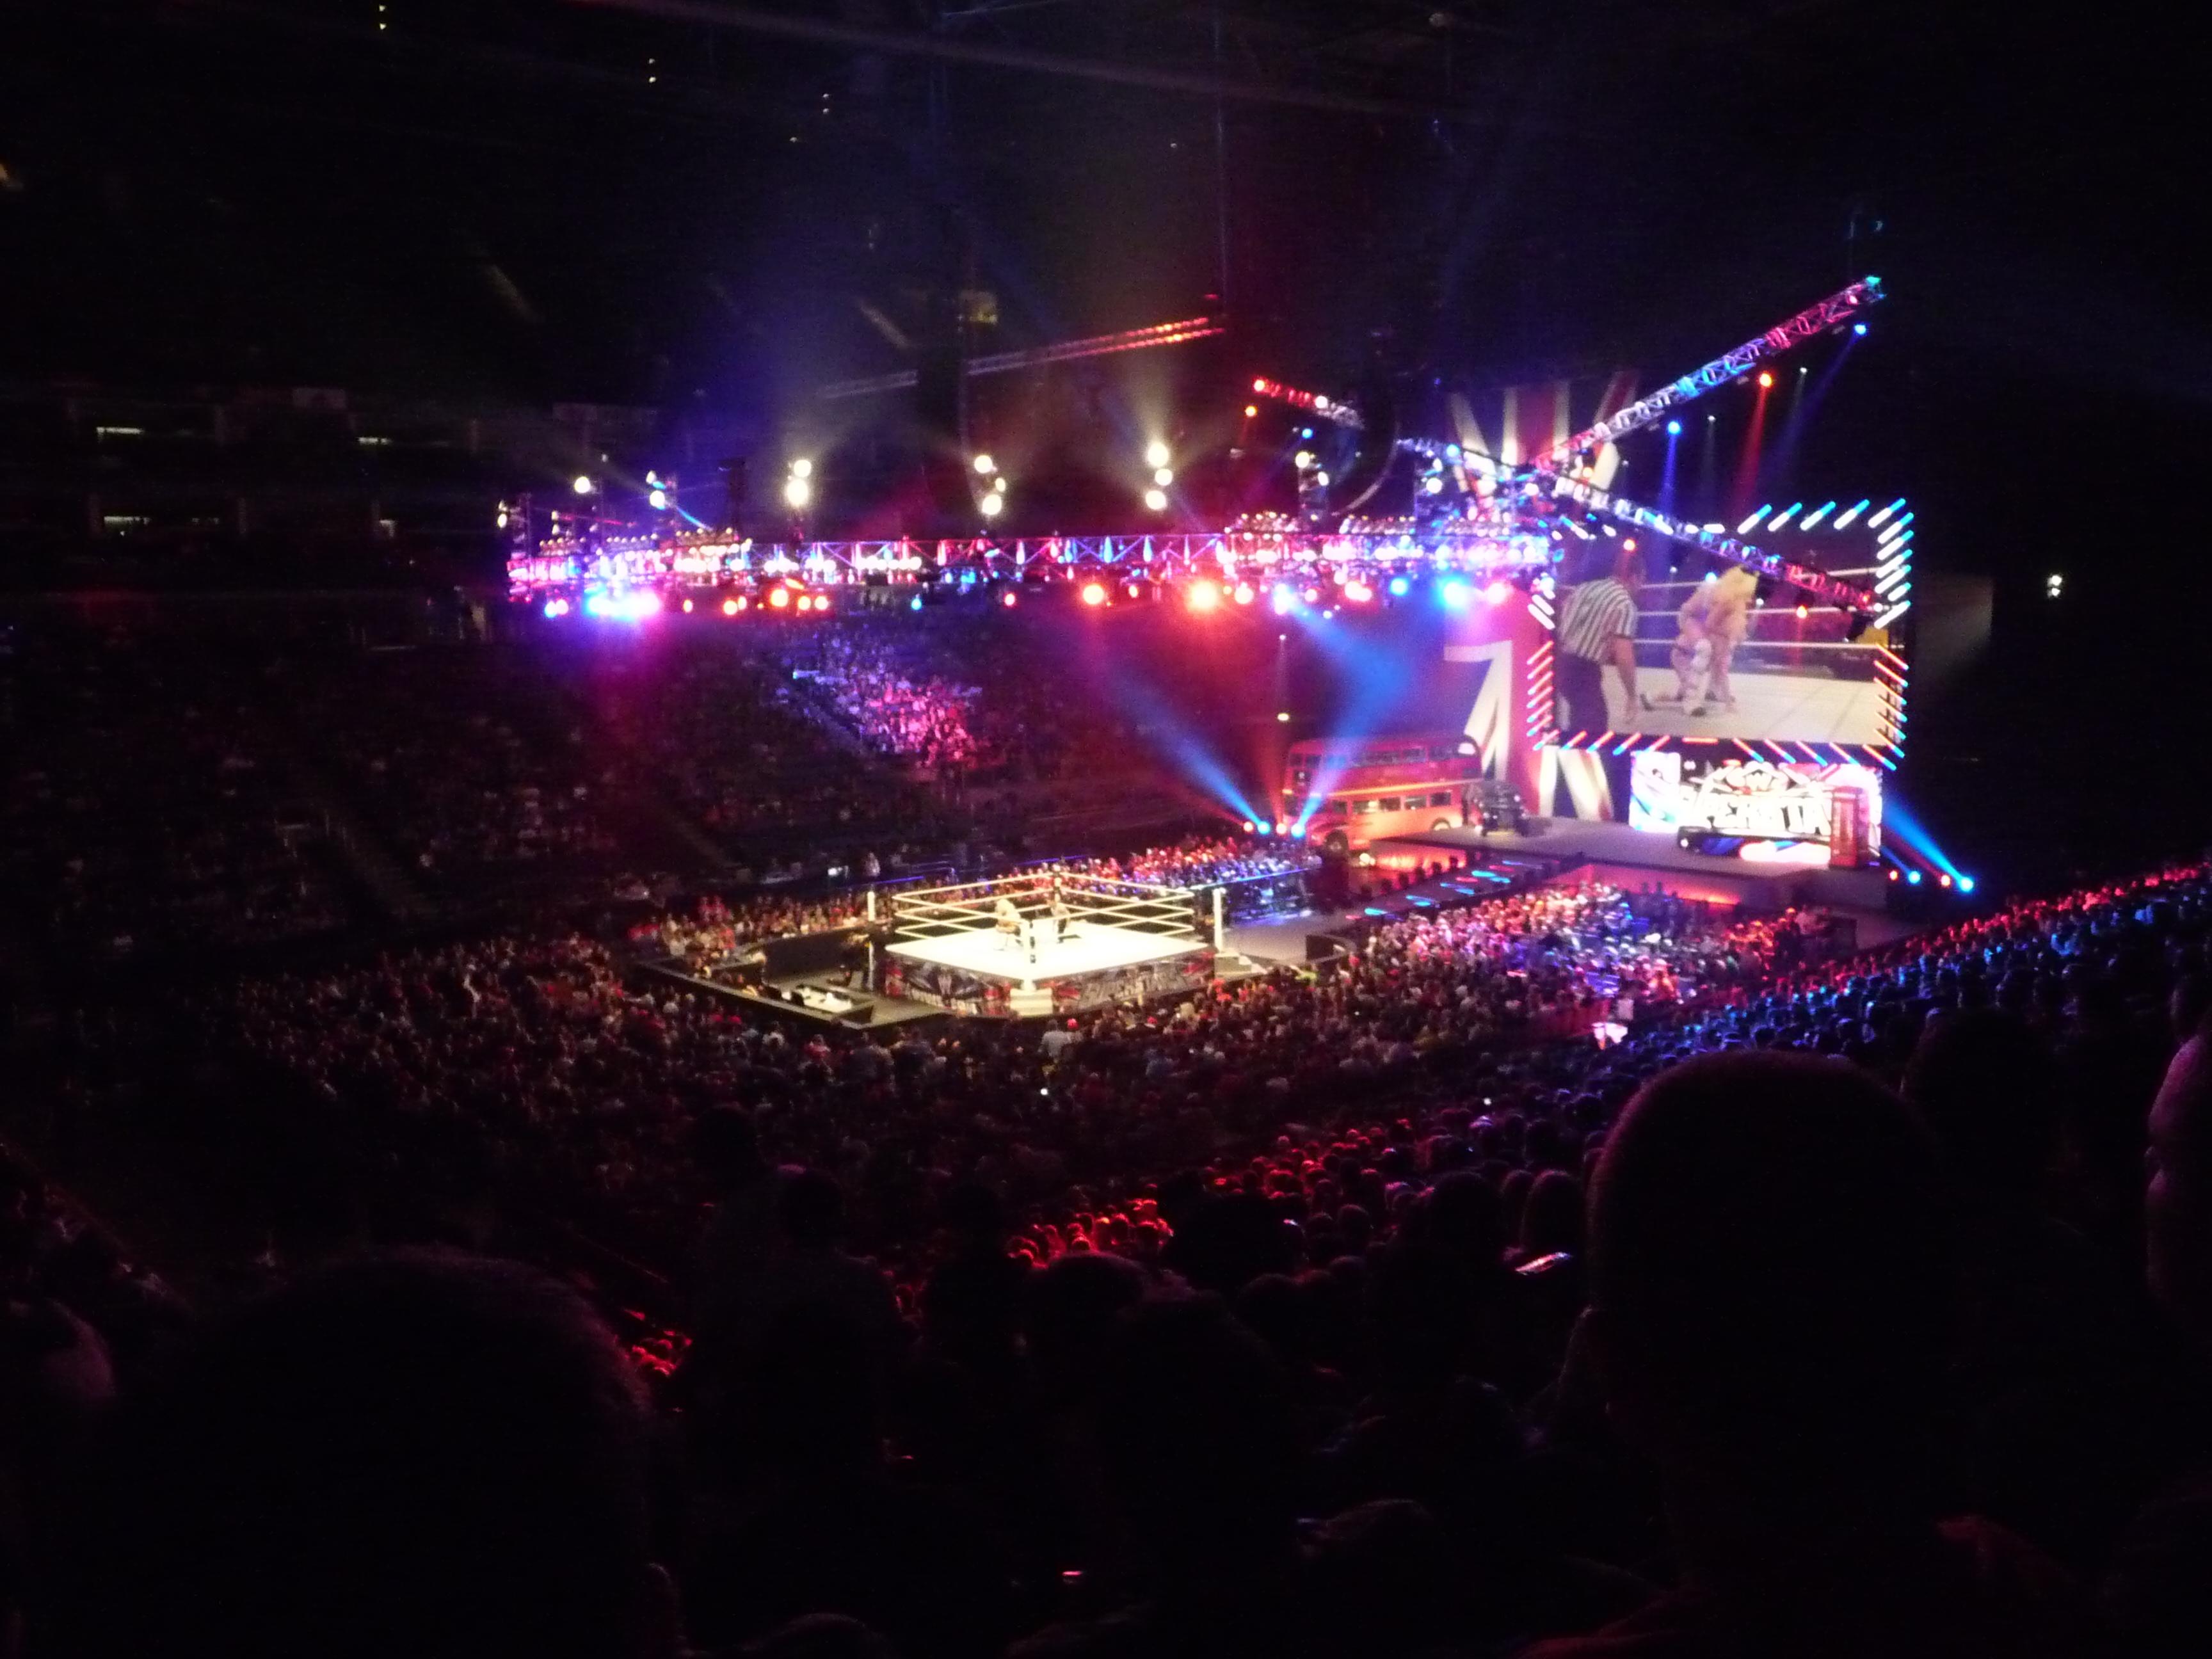 WWE Raw Arena